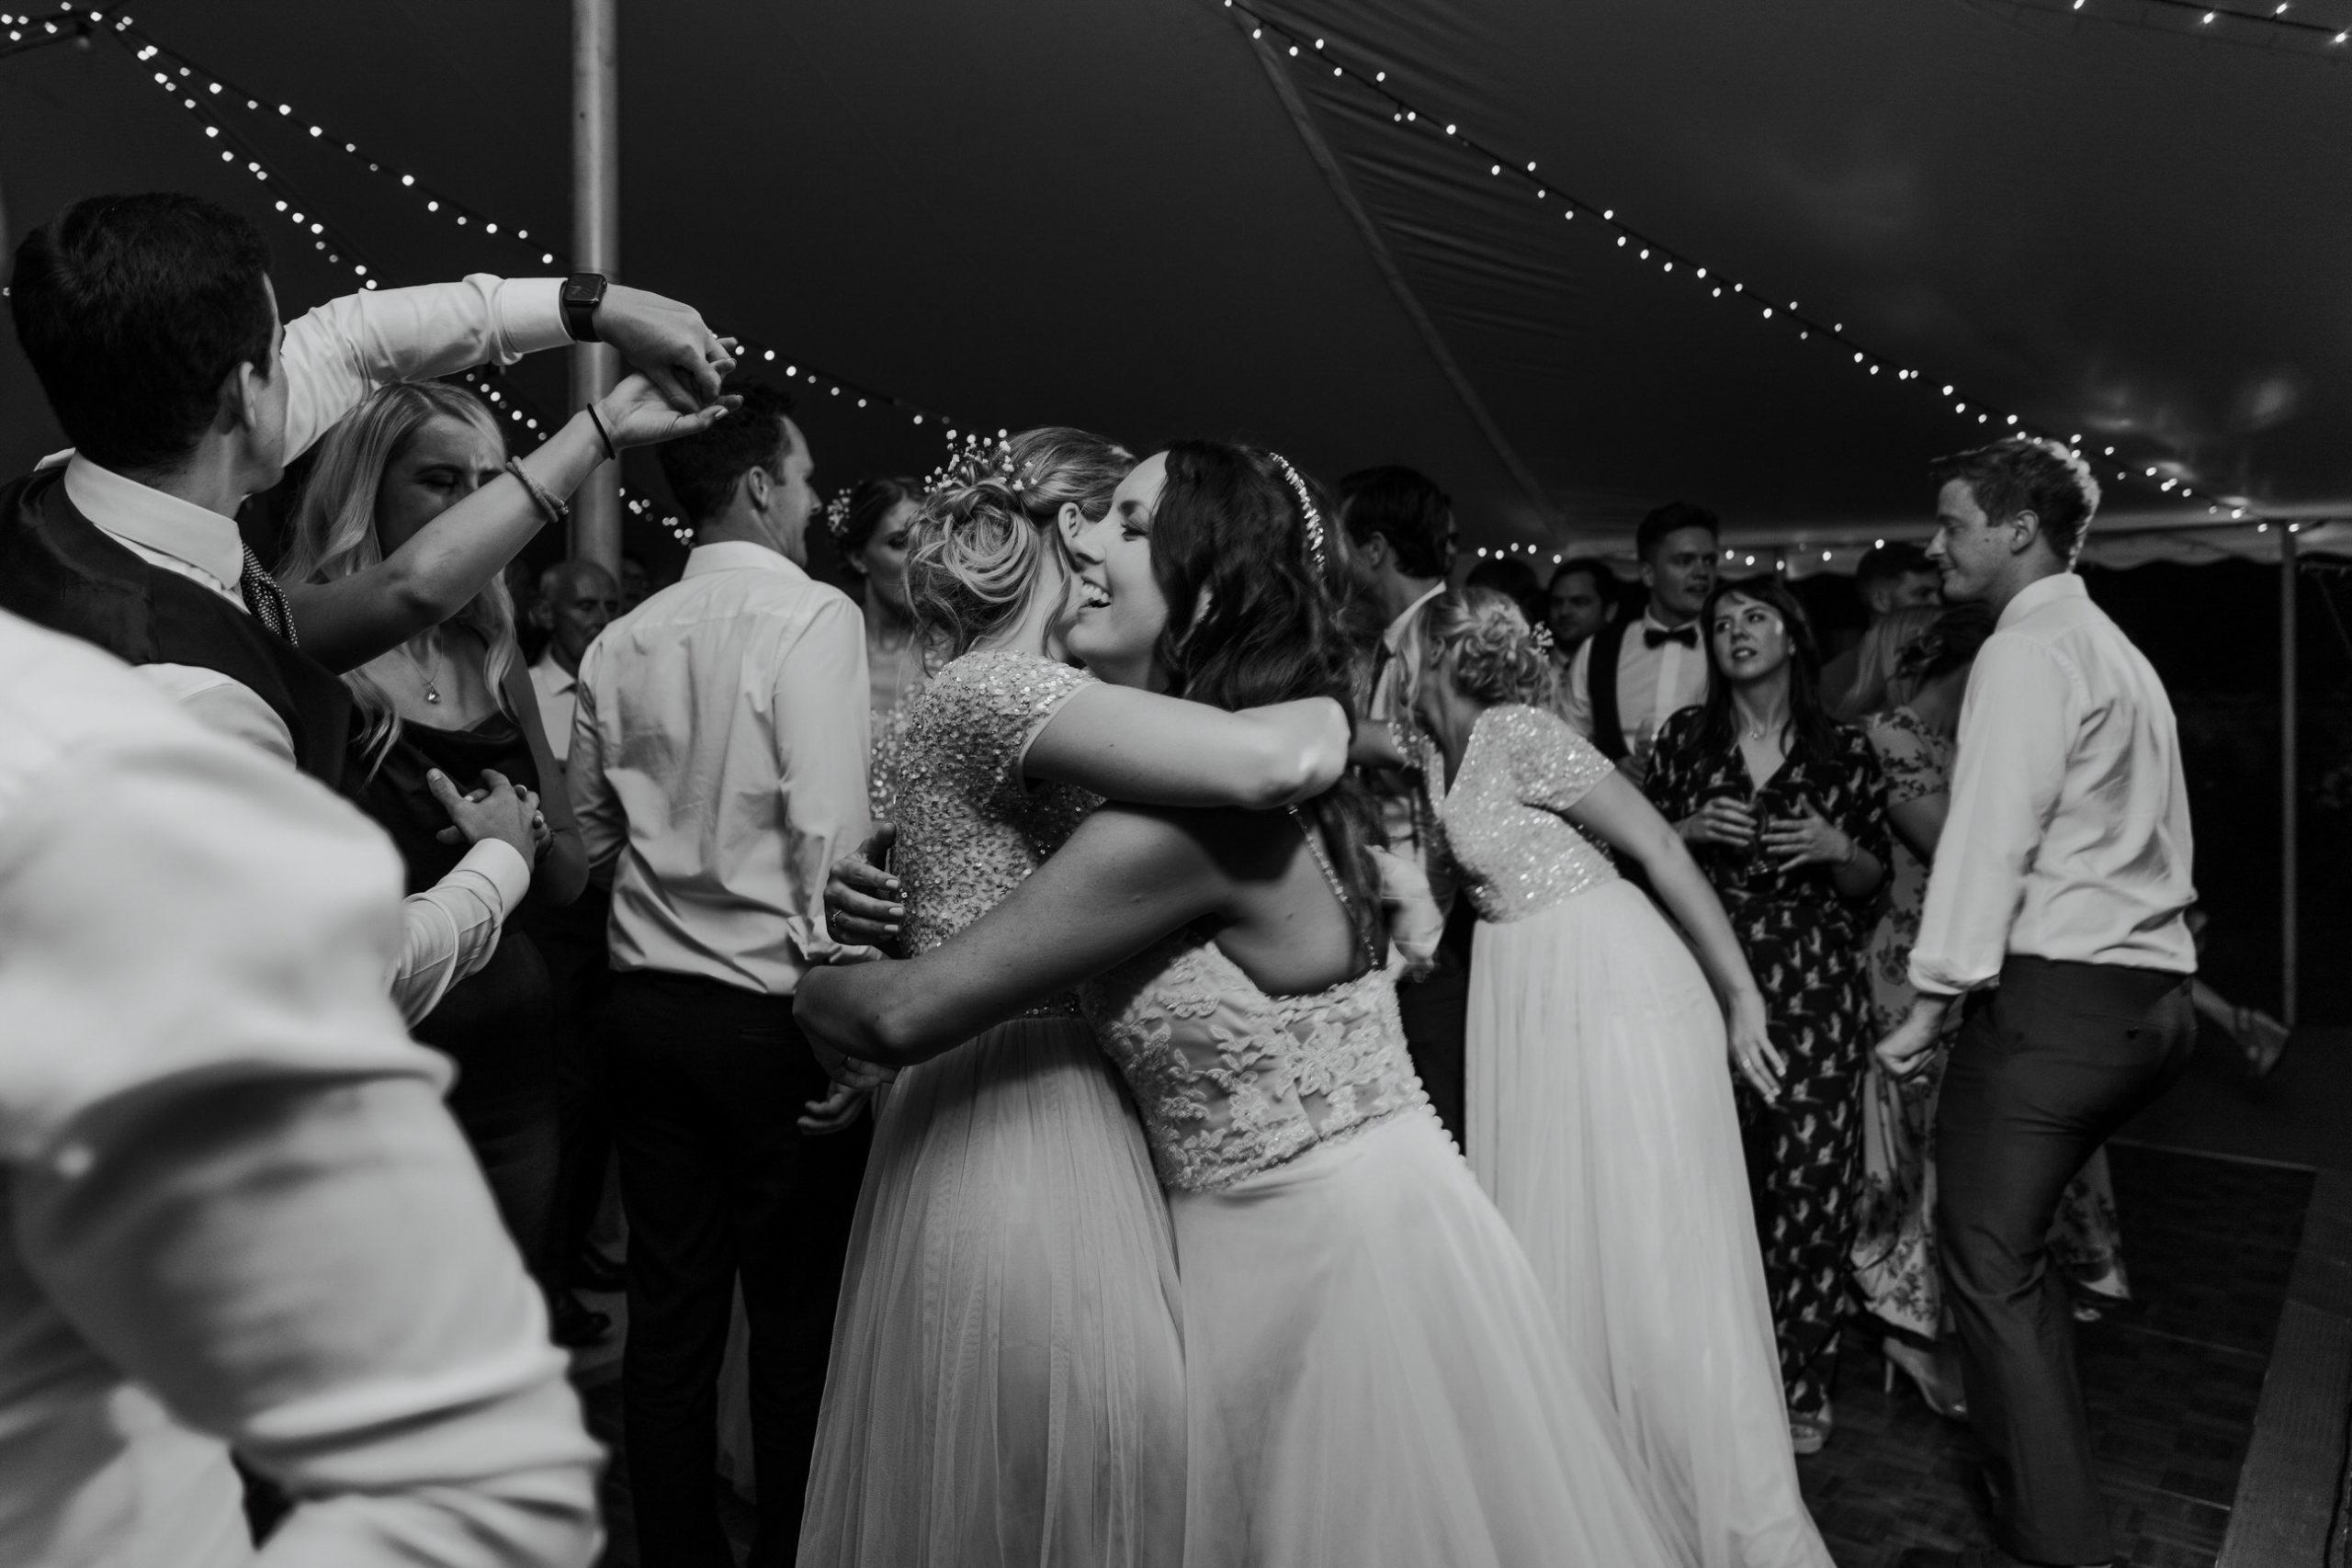 wedding party dance floor bride bridesmaids love dancing